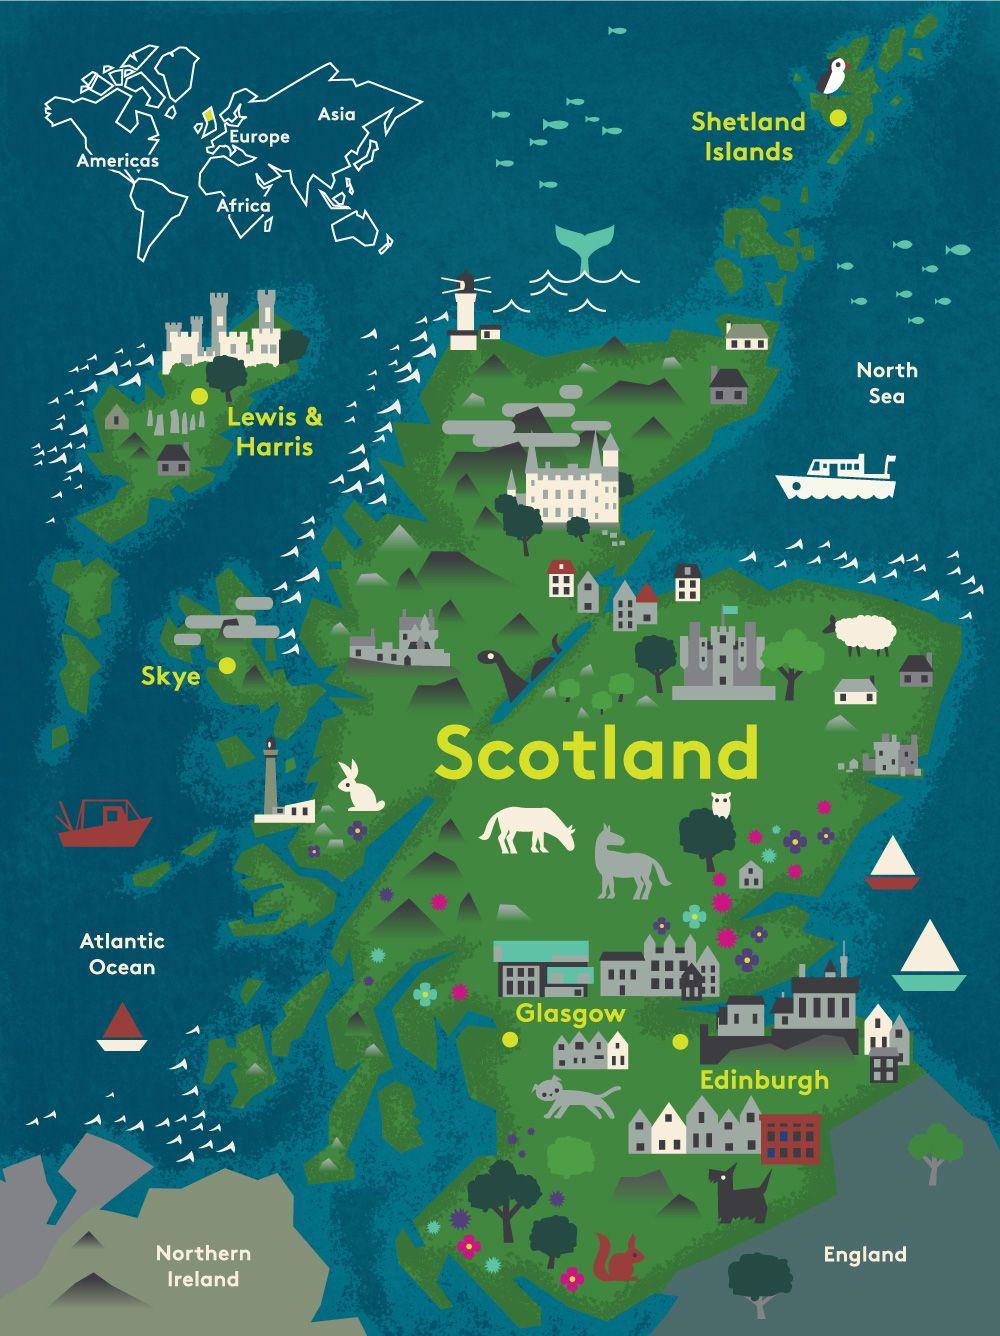 Destination Scotland Inspirational Photos and Stories